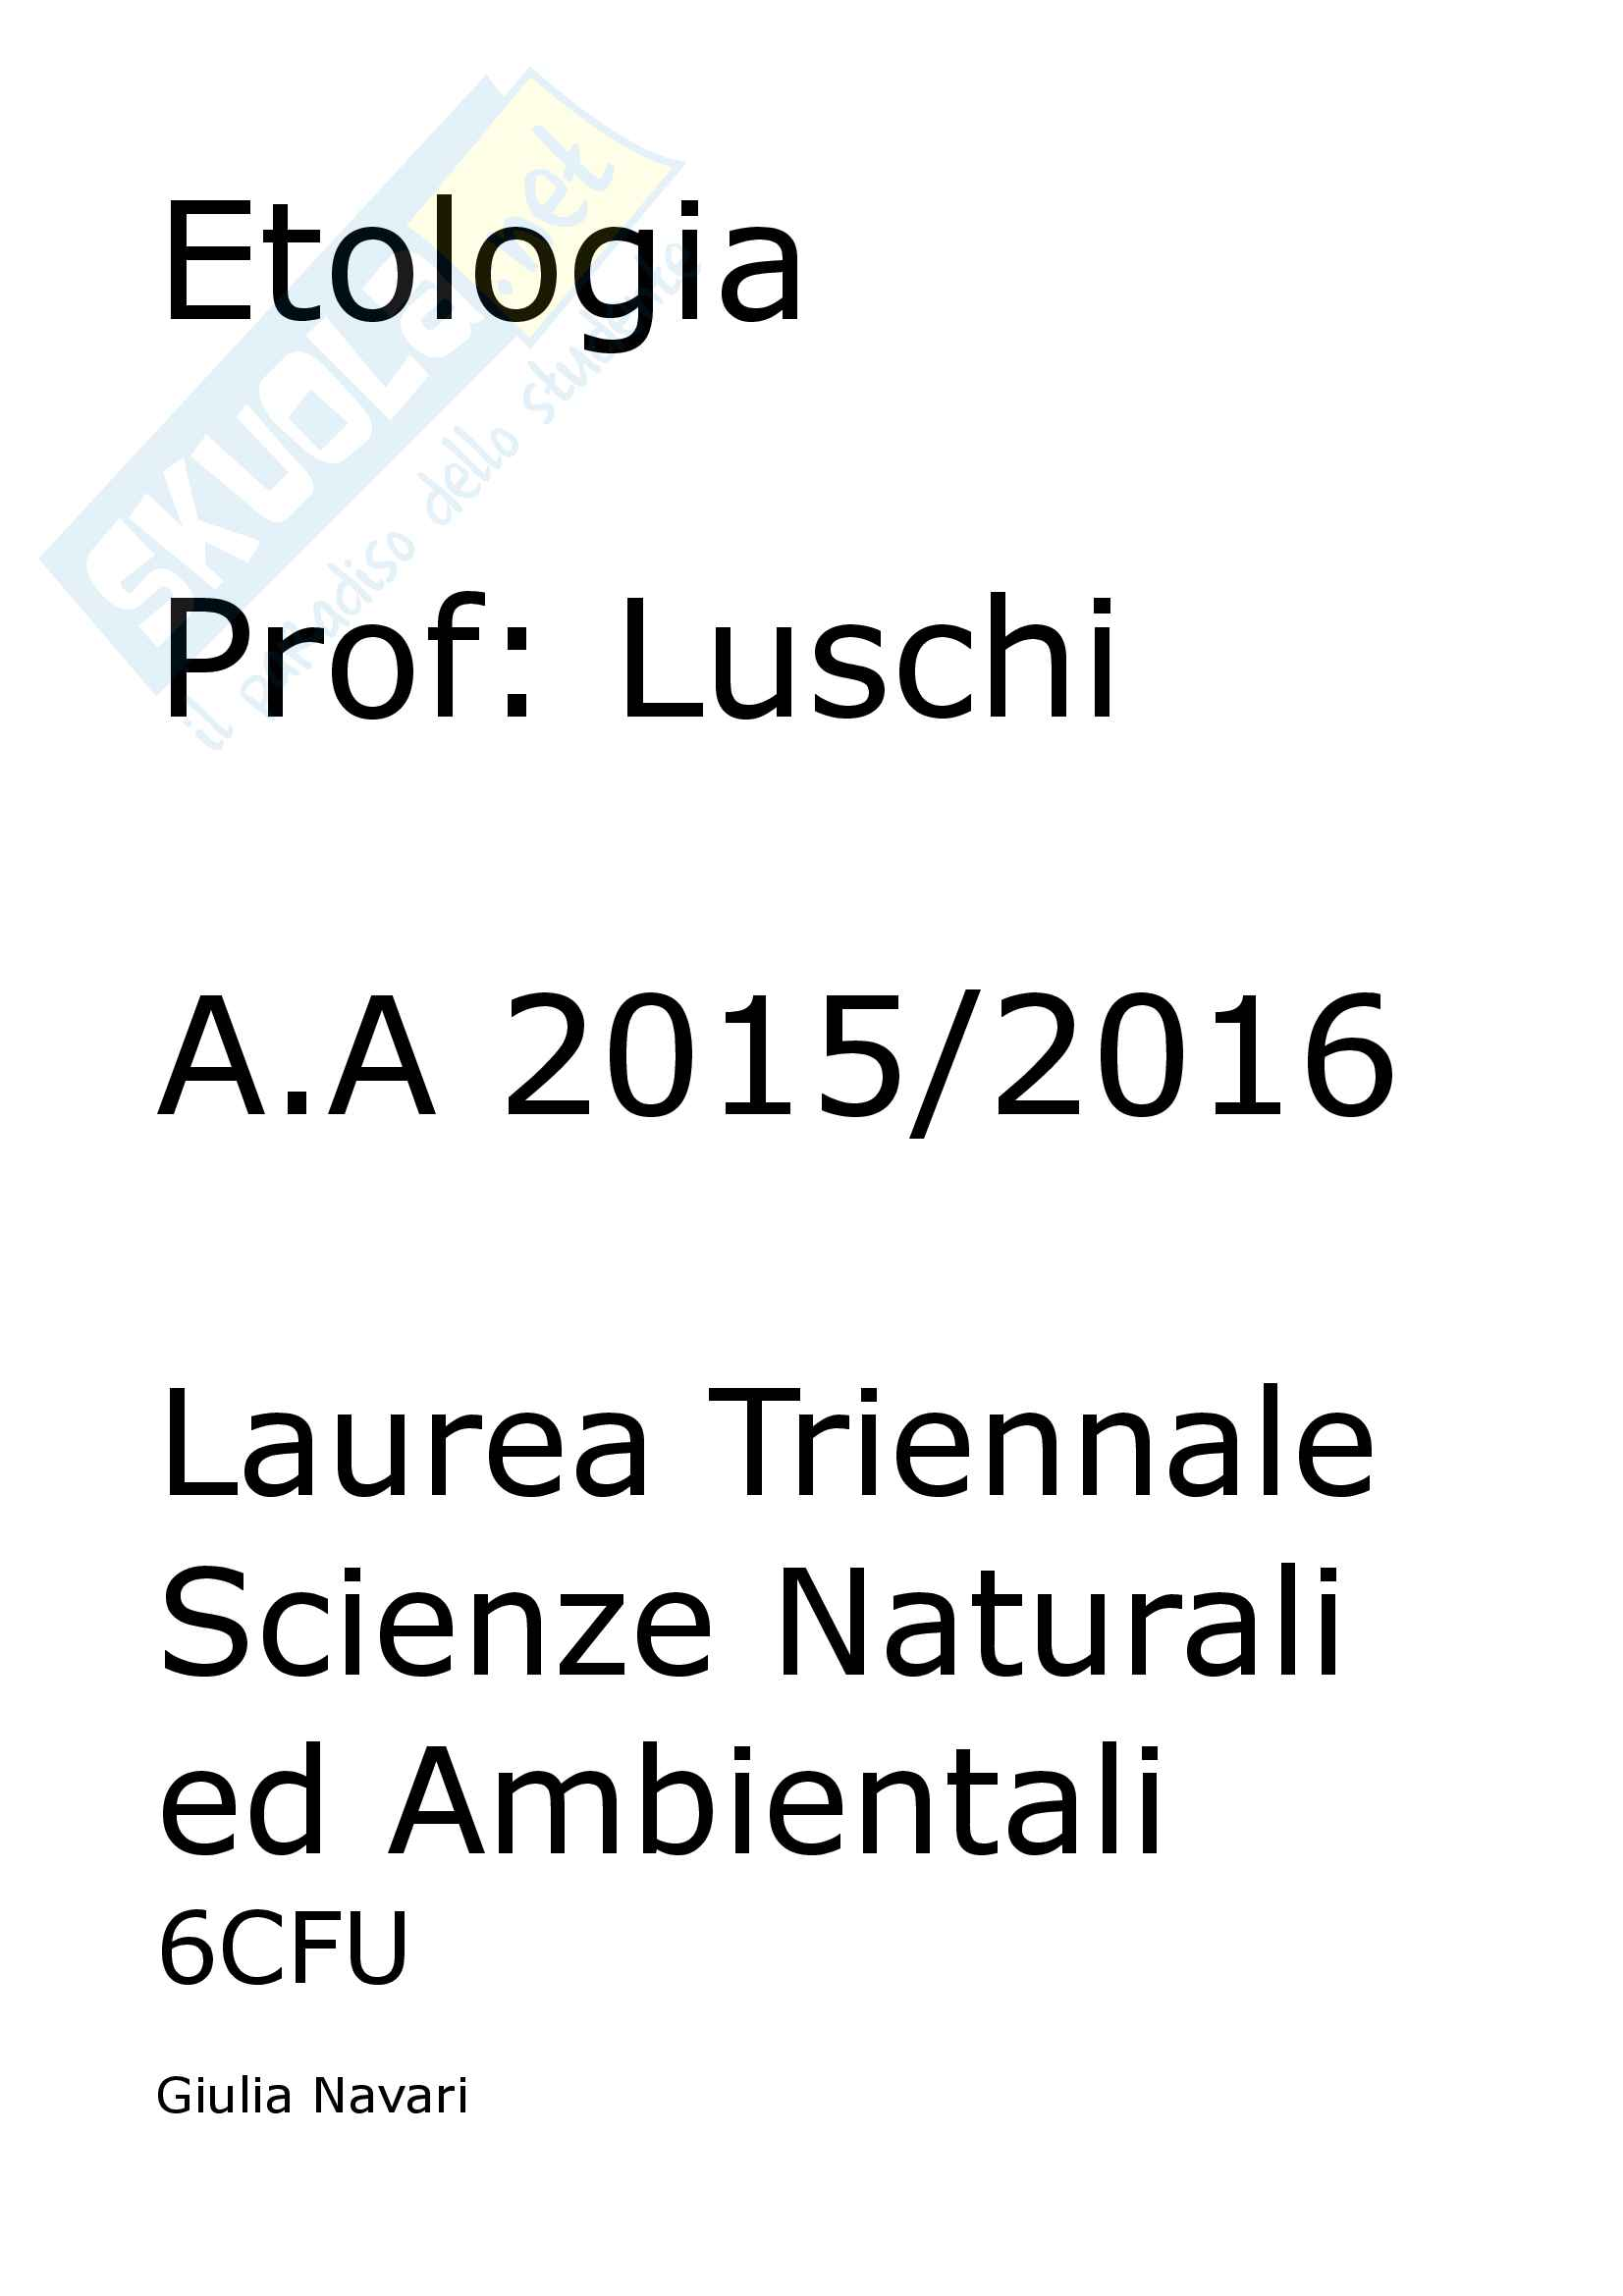 Etologia A.A 15/16 (6CFU). Esame opzionale del 3 anno, scienze naturali ed ambientali